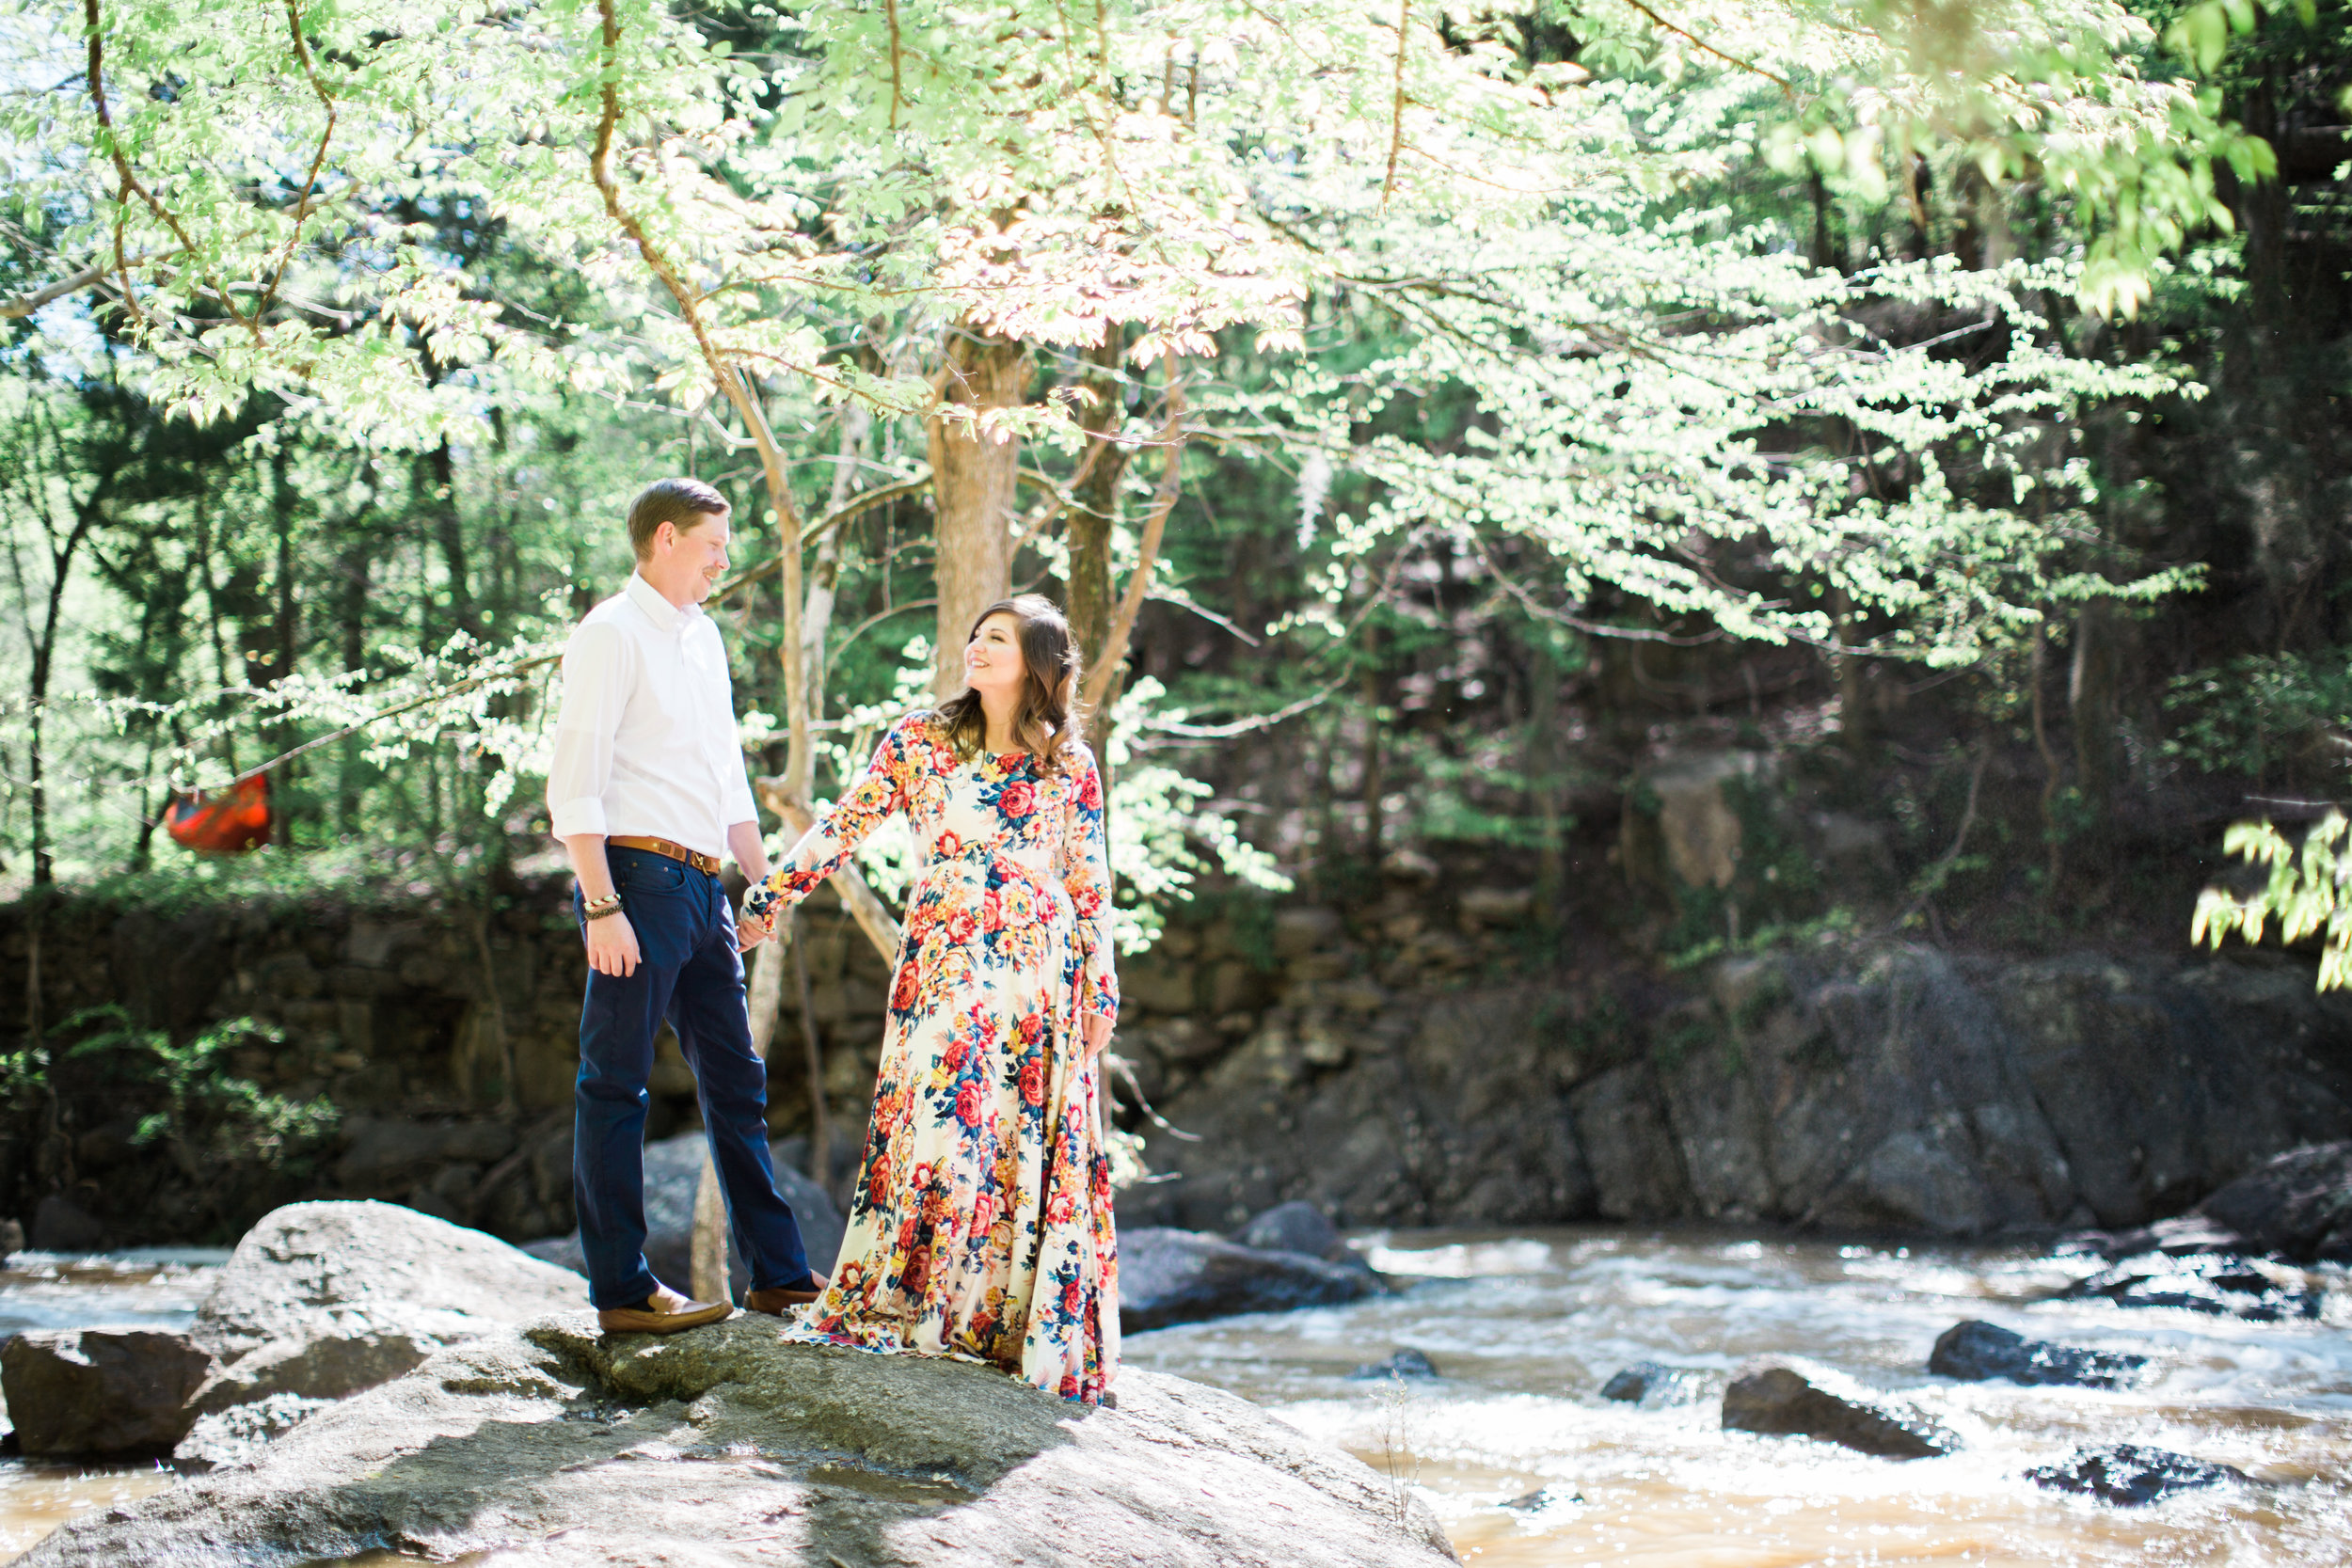 Nick-Drollette-Photography-Auburn-Alabama-100.jpg